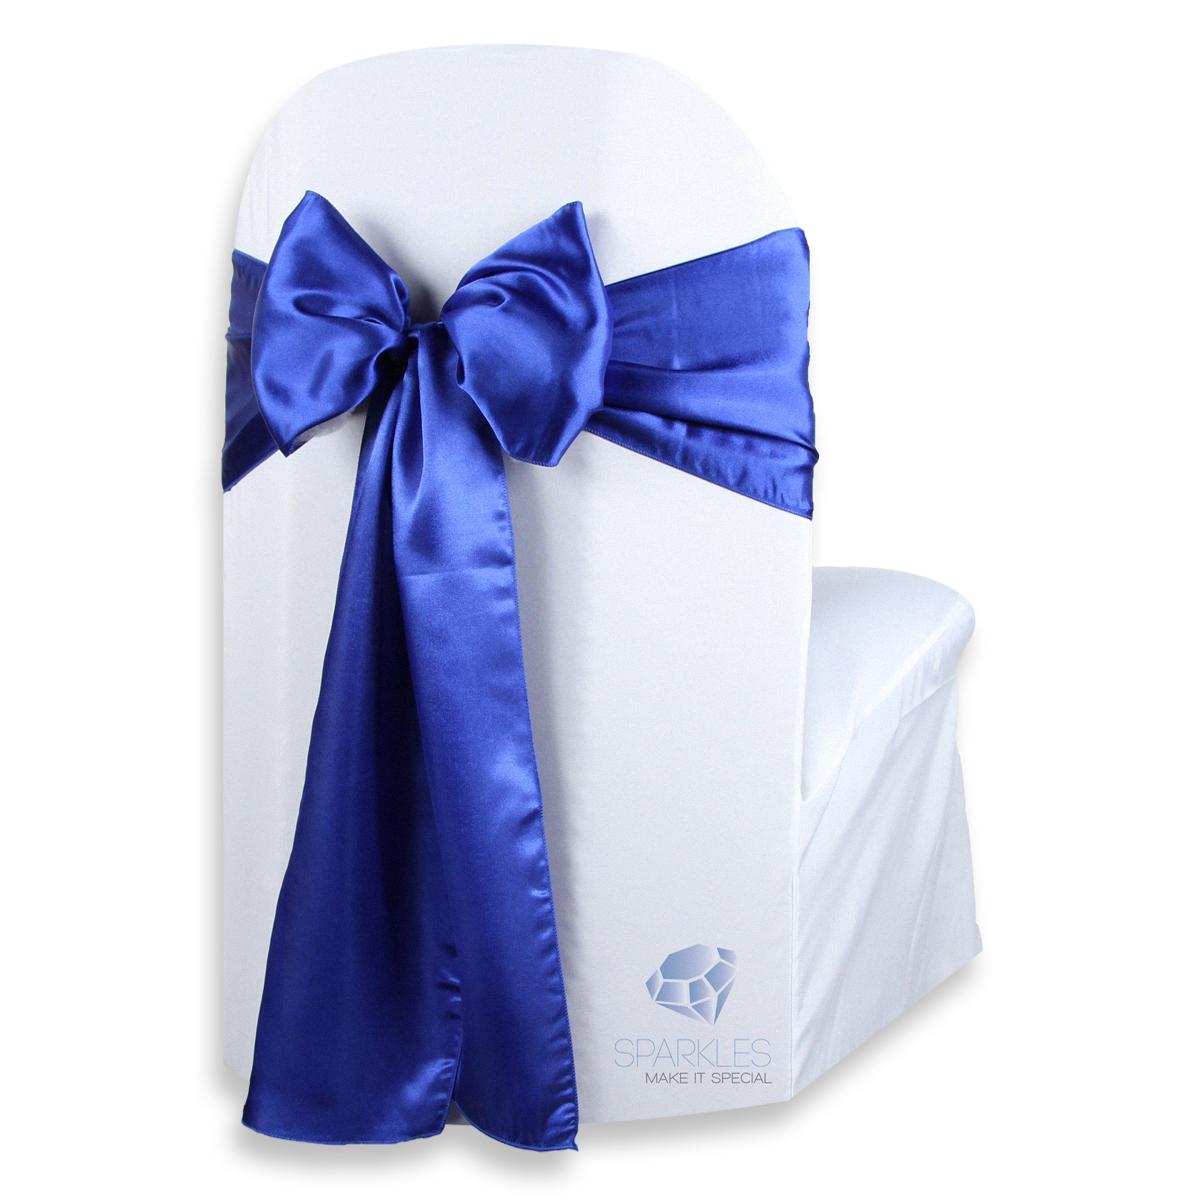 50 pcs satin chair cover bow sash 108 quot x8 quot royal blue wedding party nn